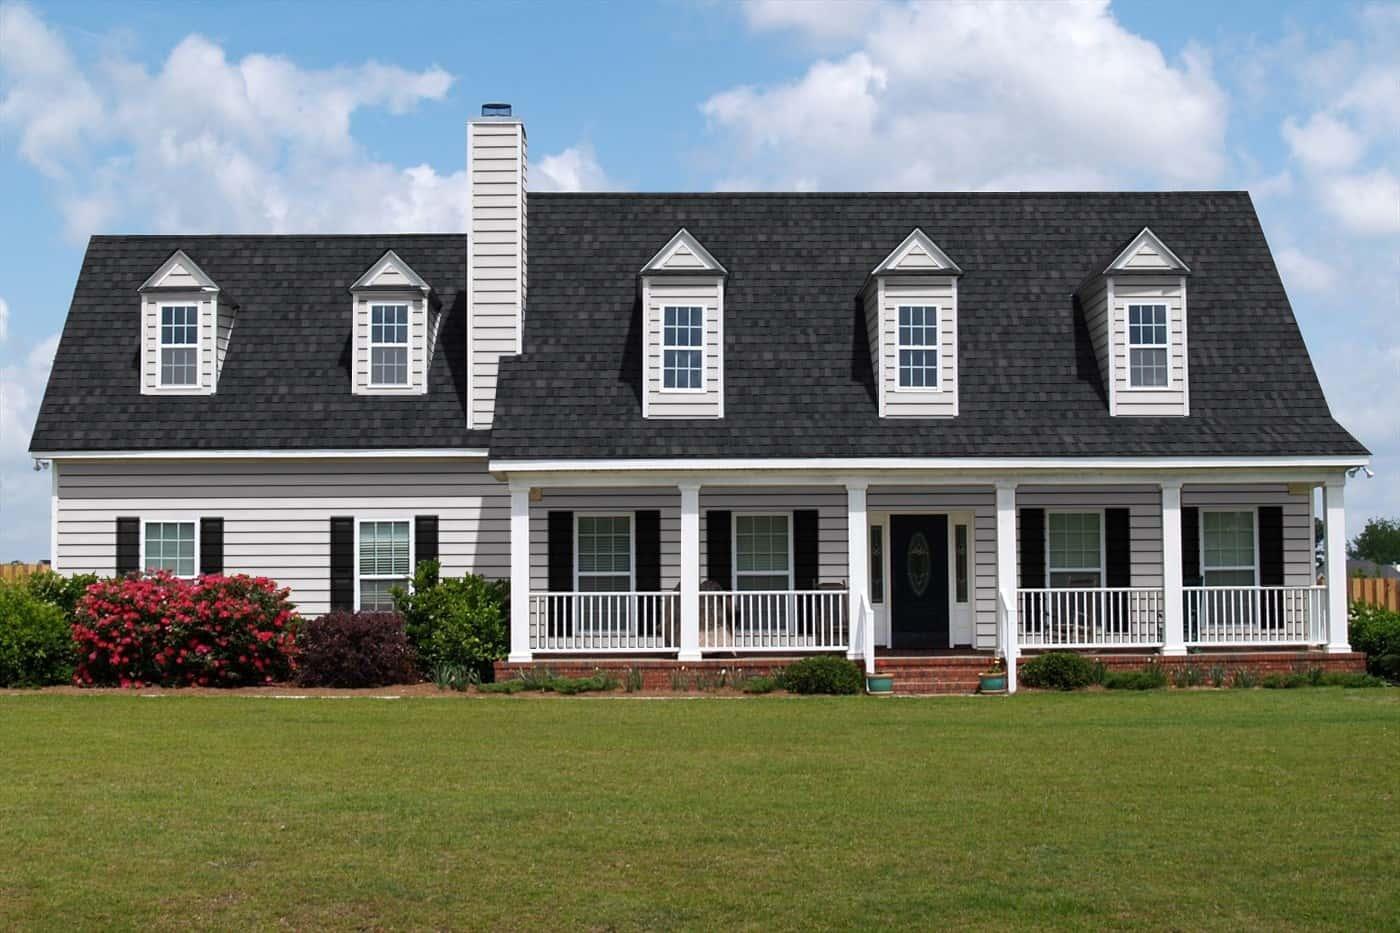 TAMKO Heritage IR Rustic Black House